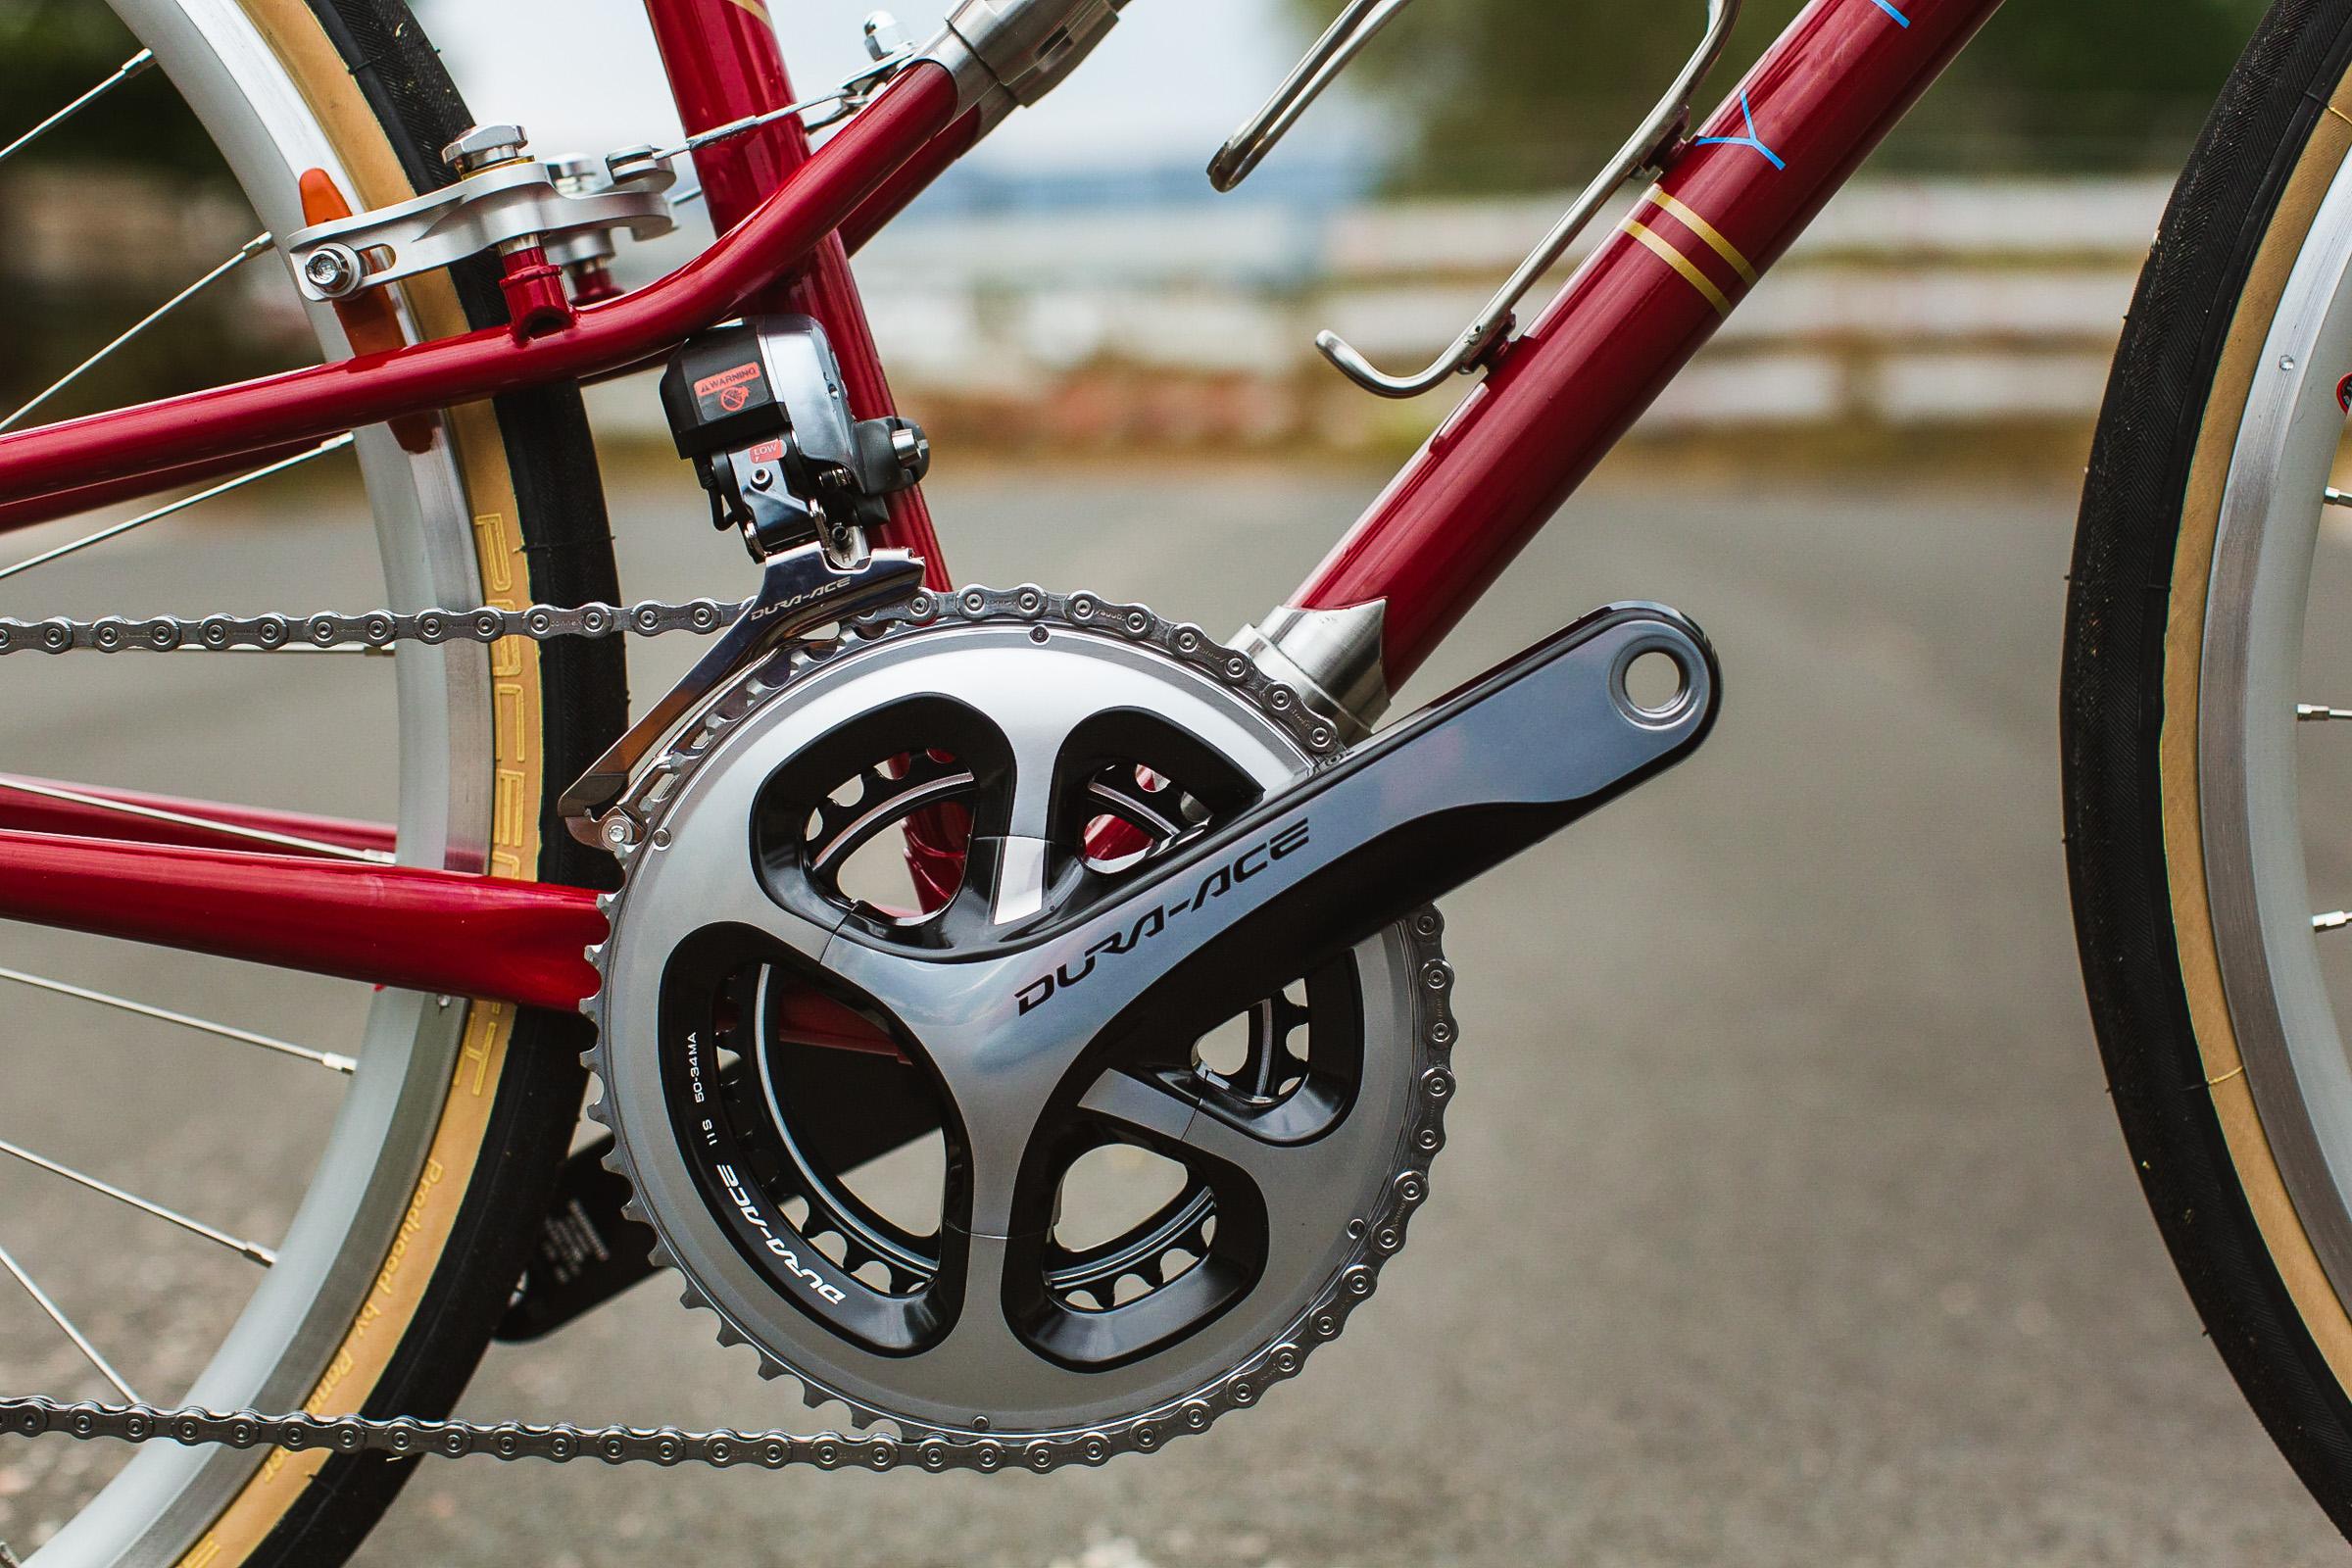 061.yipsan-bicycles-creators-series.traverse.jpg